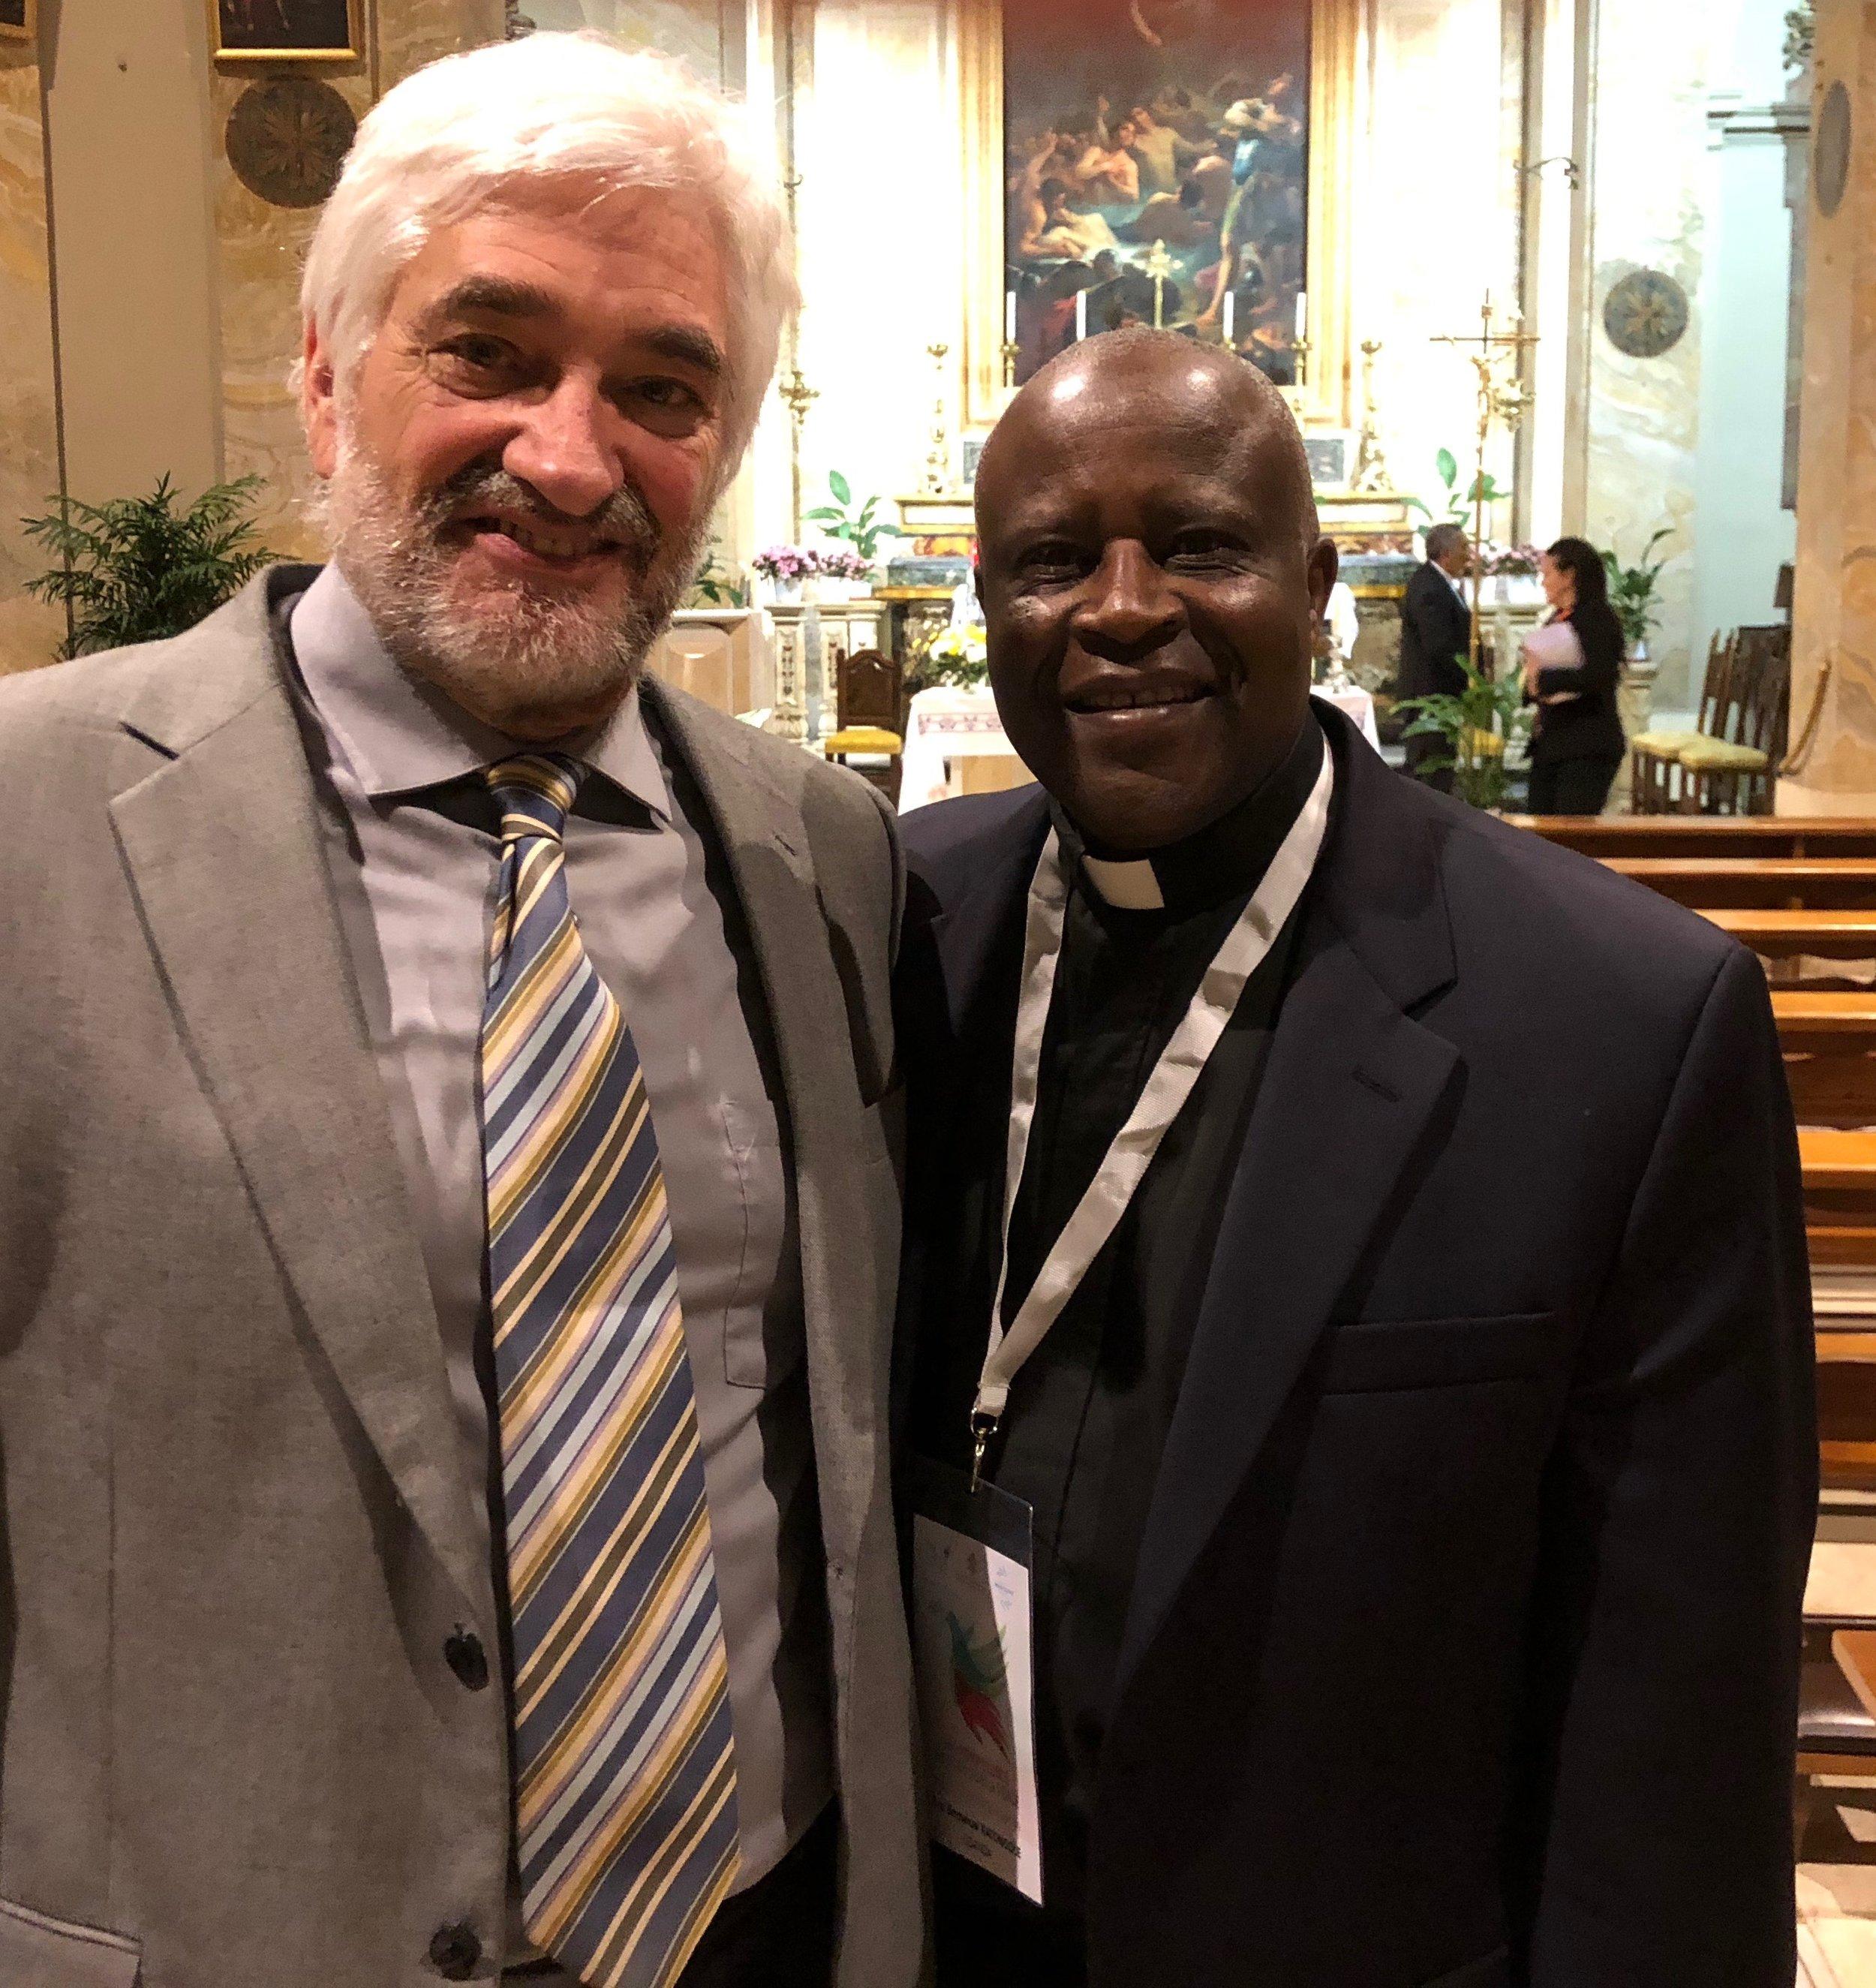 Ken Butigan and Emmanuel Katongole